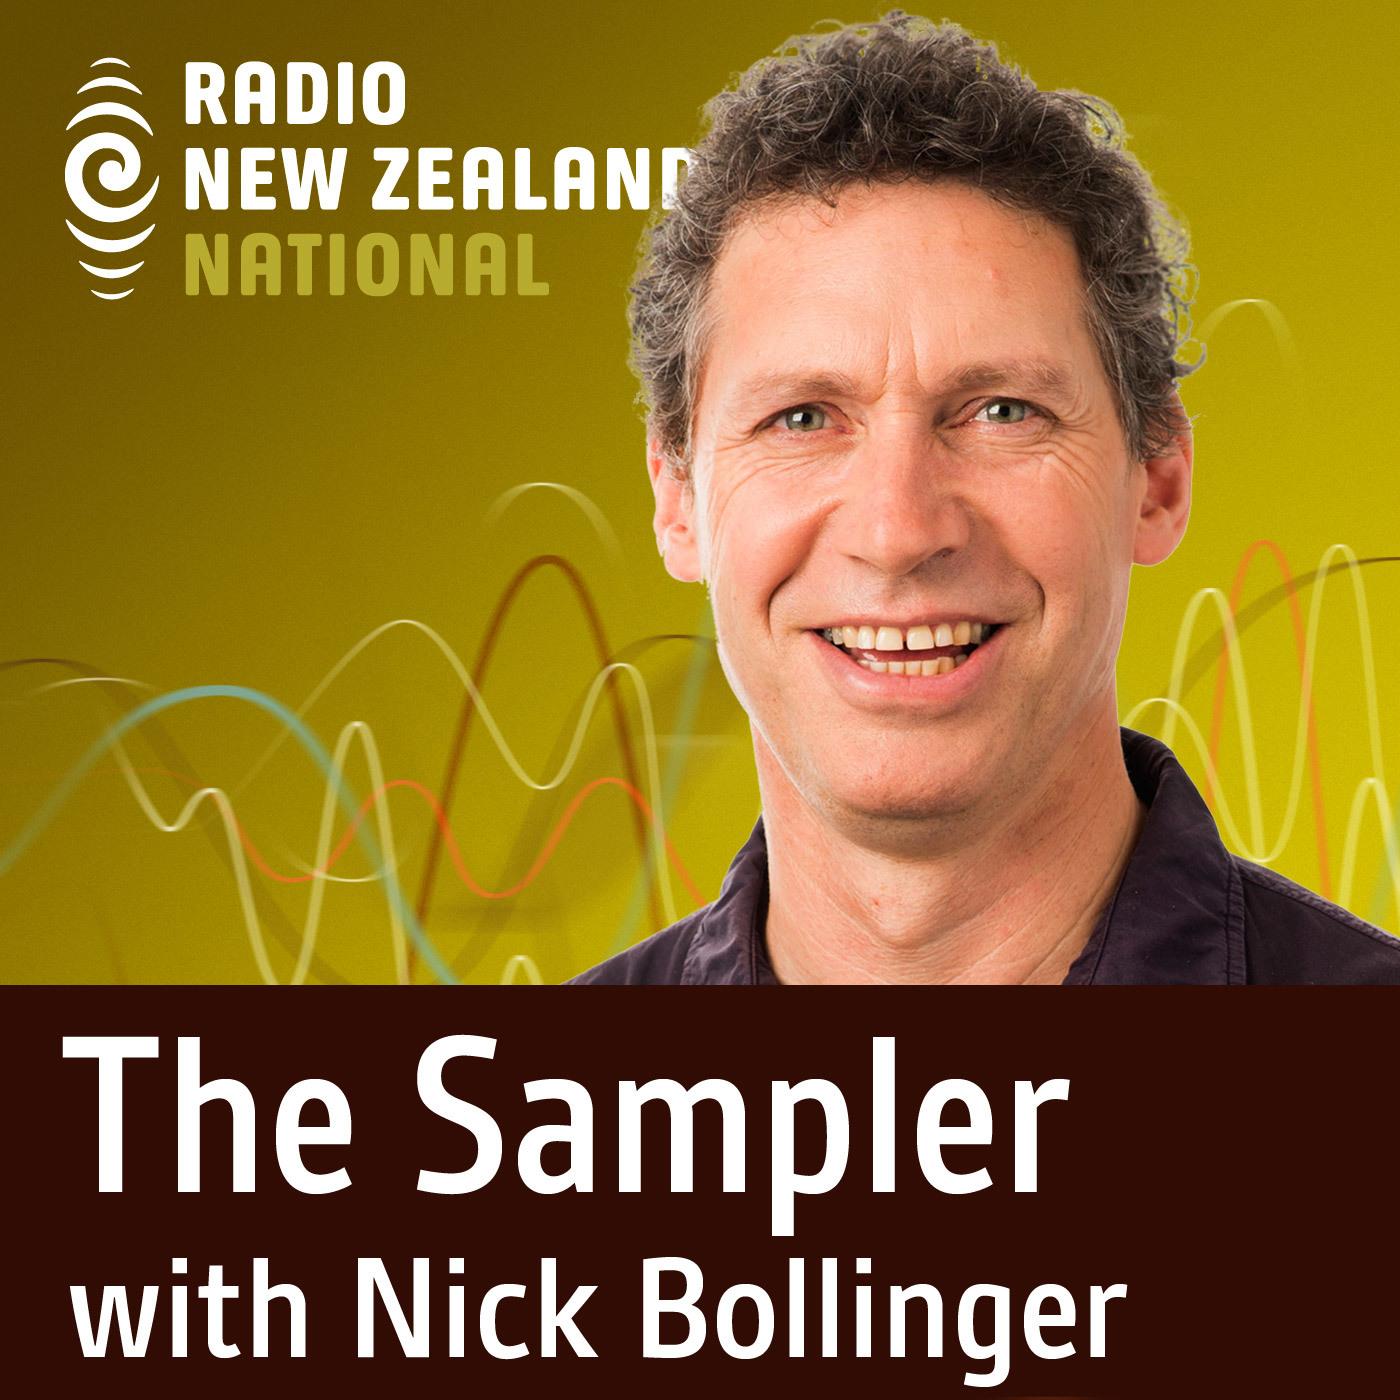 RNZ: The Sampler